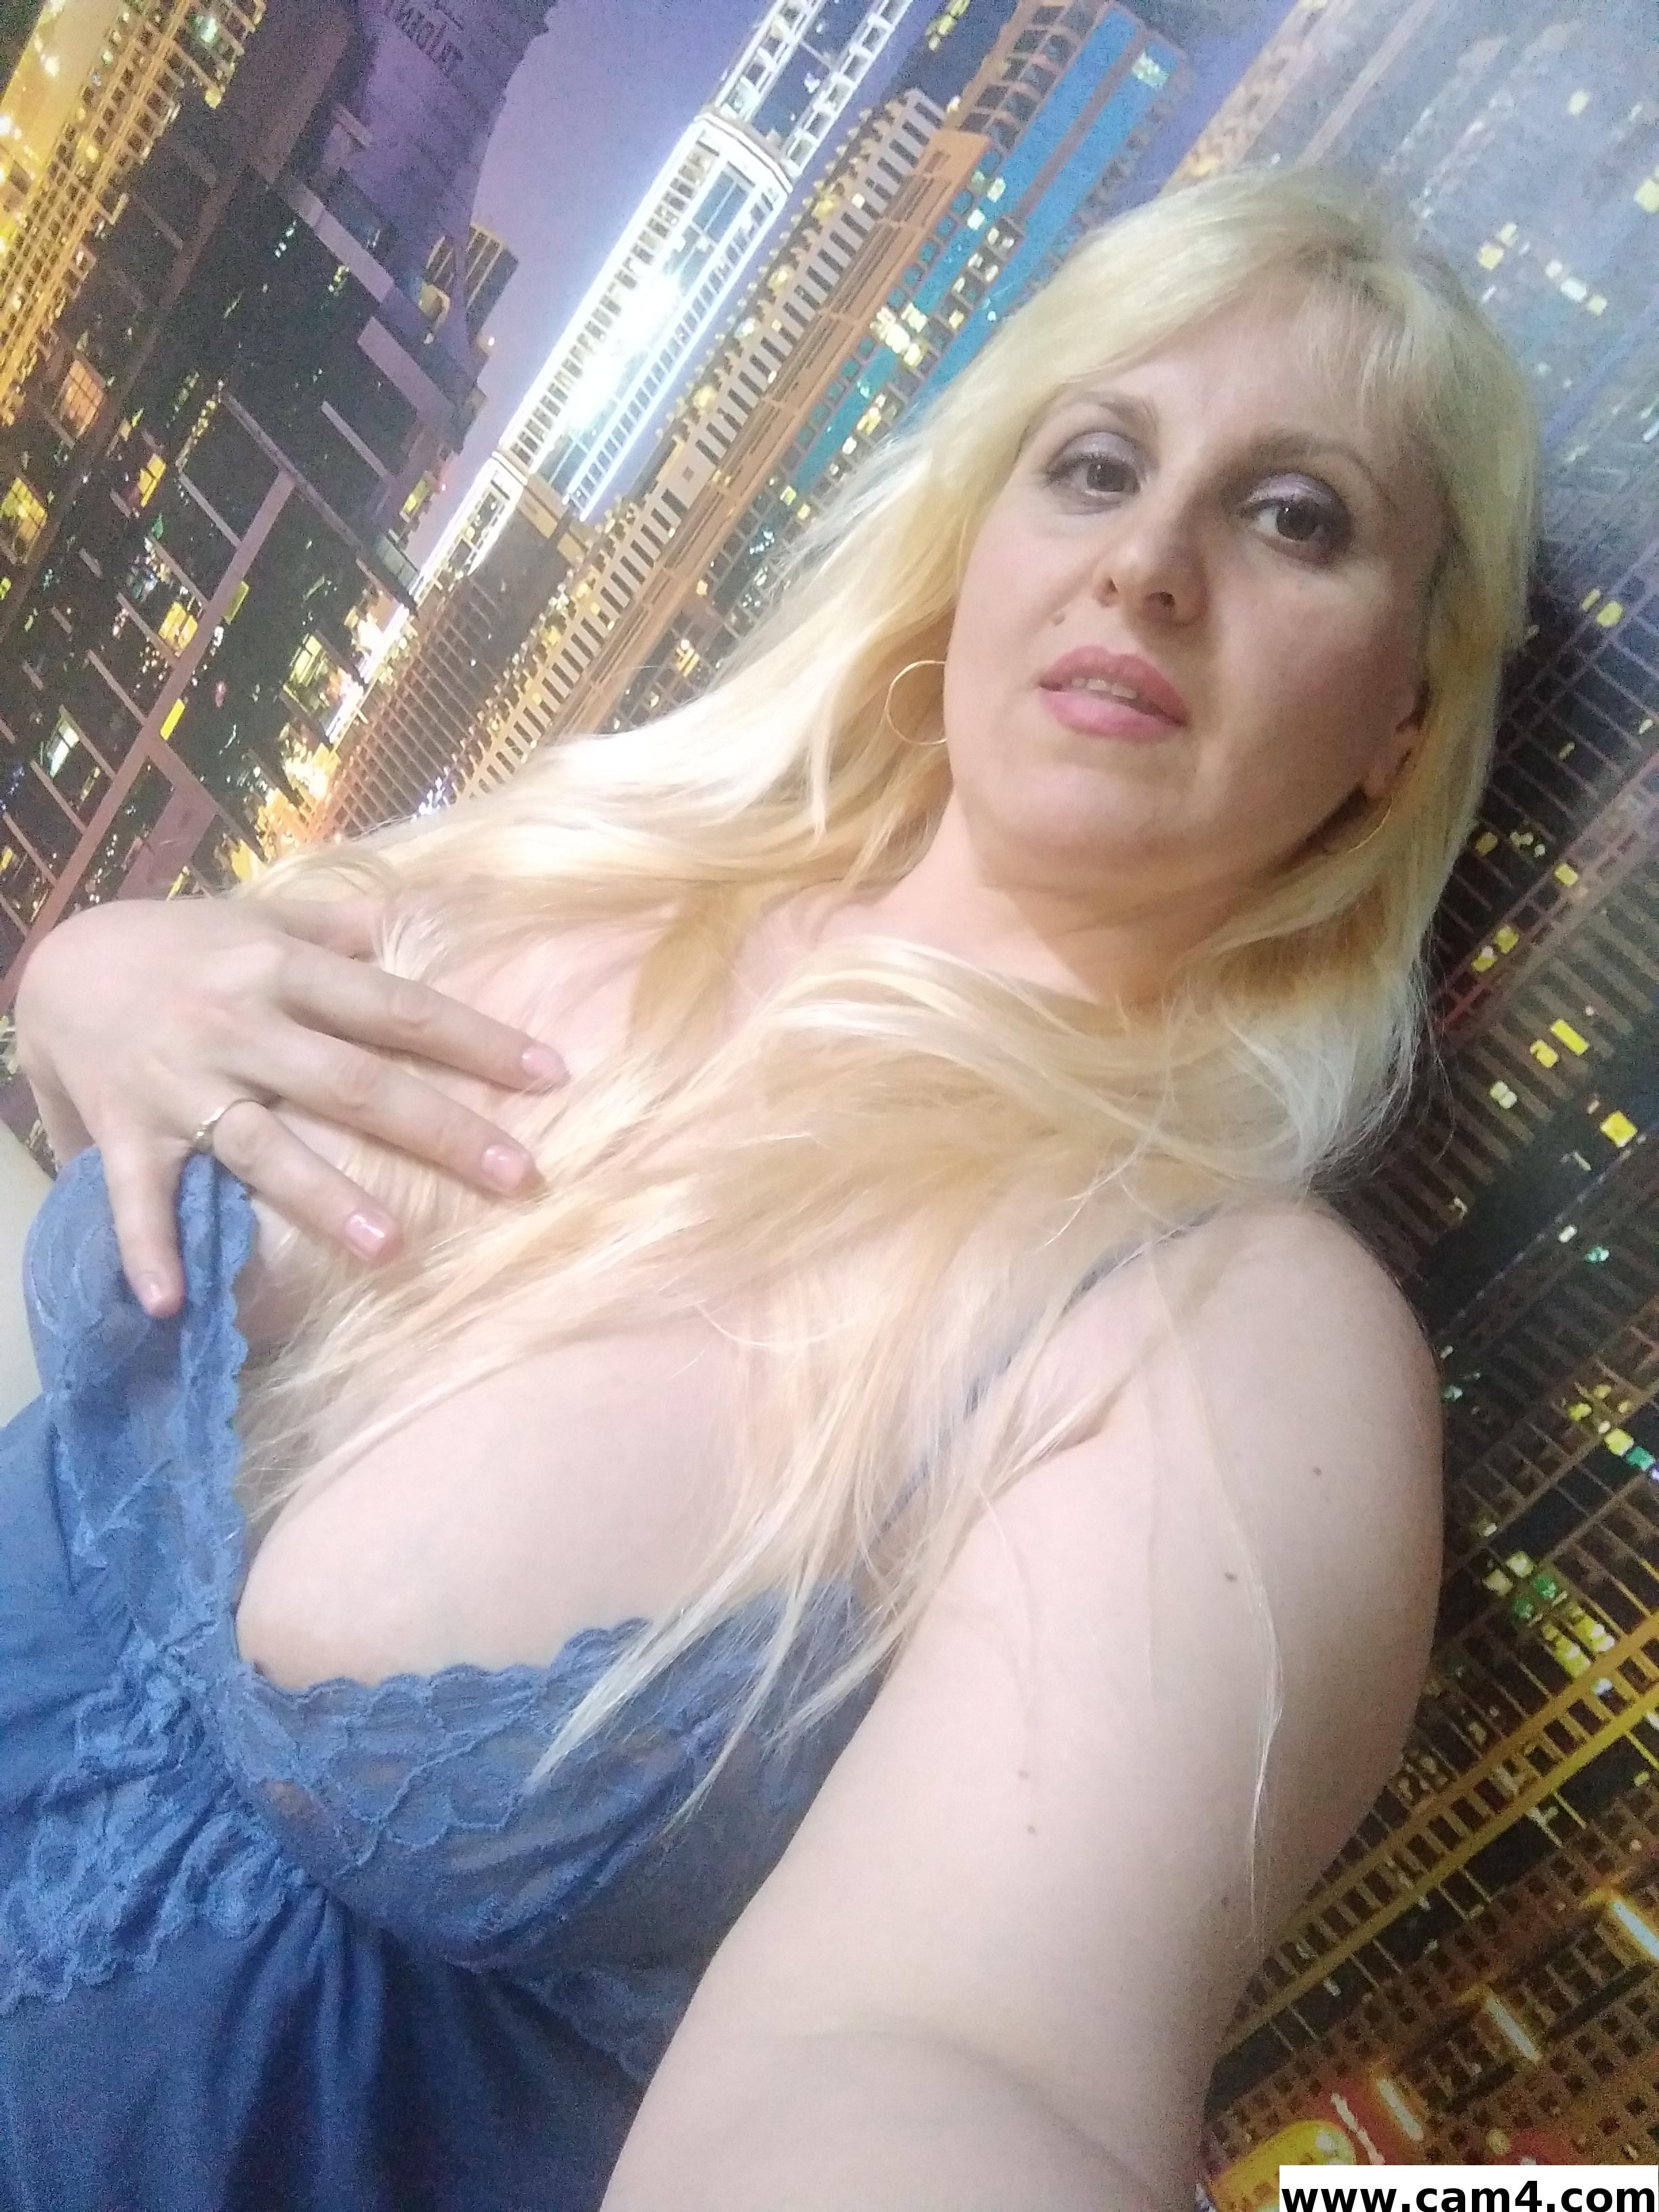 Blondabella?s=ateqpa0iozau56dhfasetmcktcfs027l3kilvhihhhk=